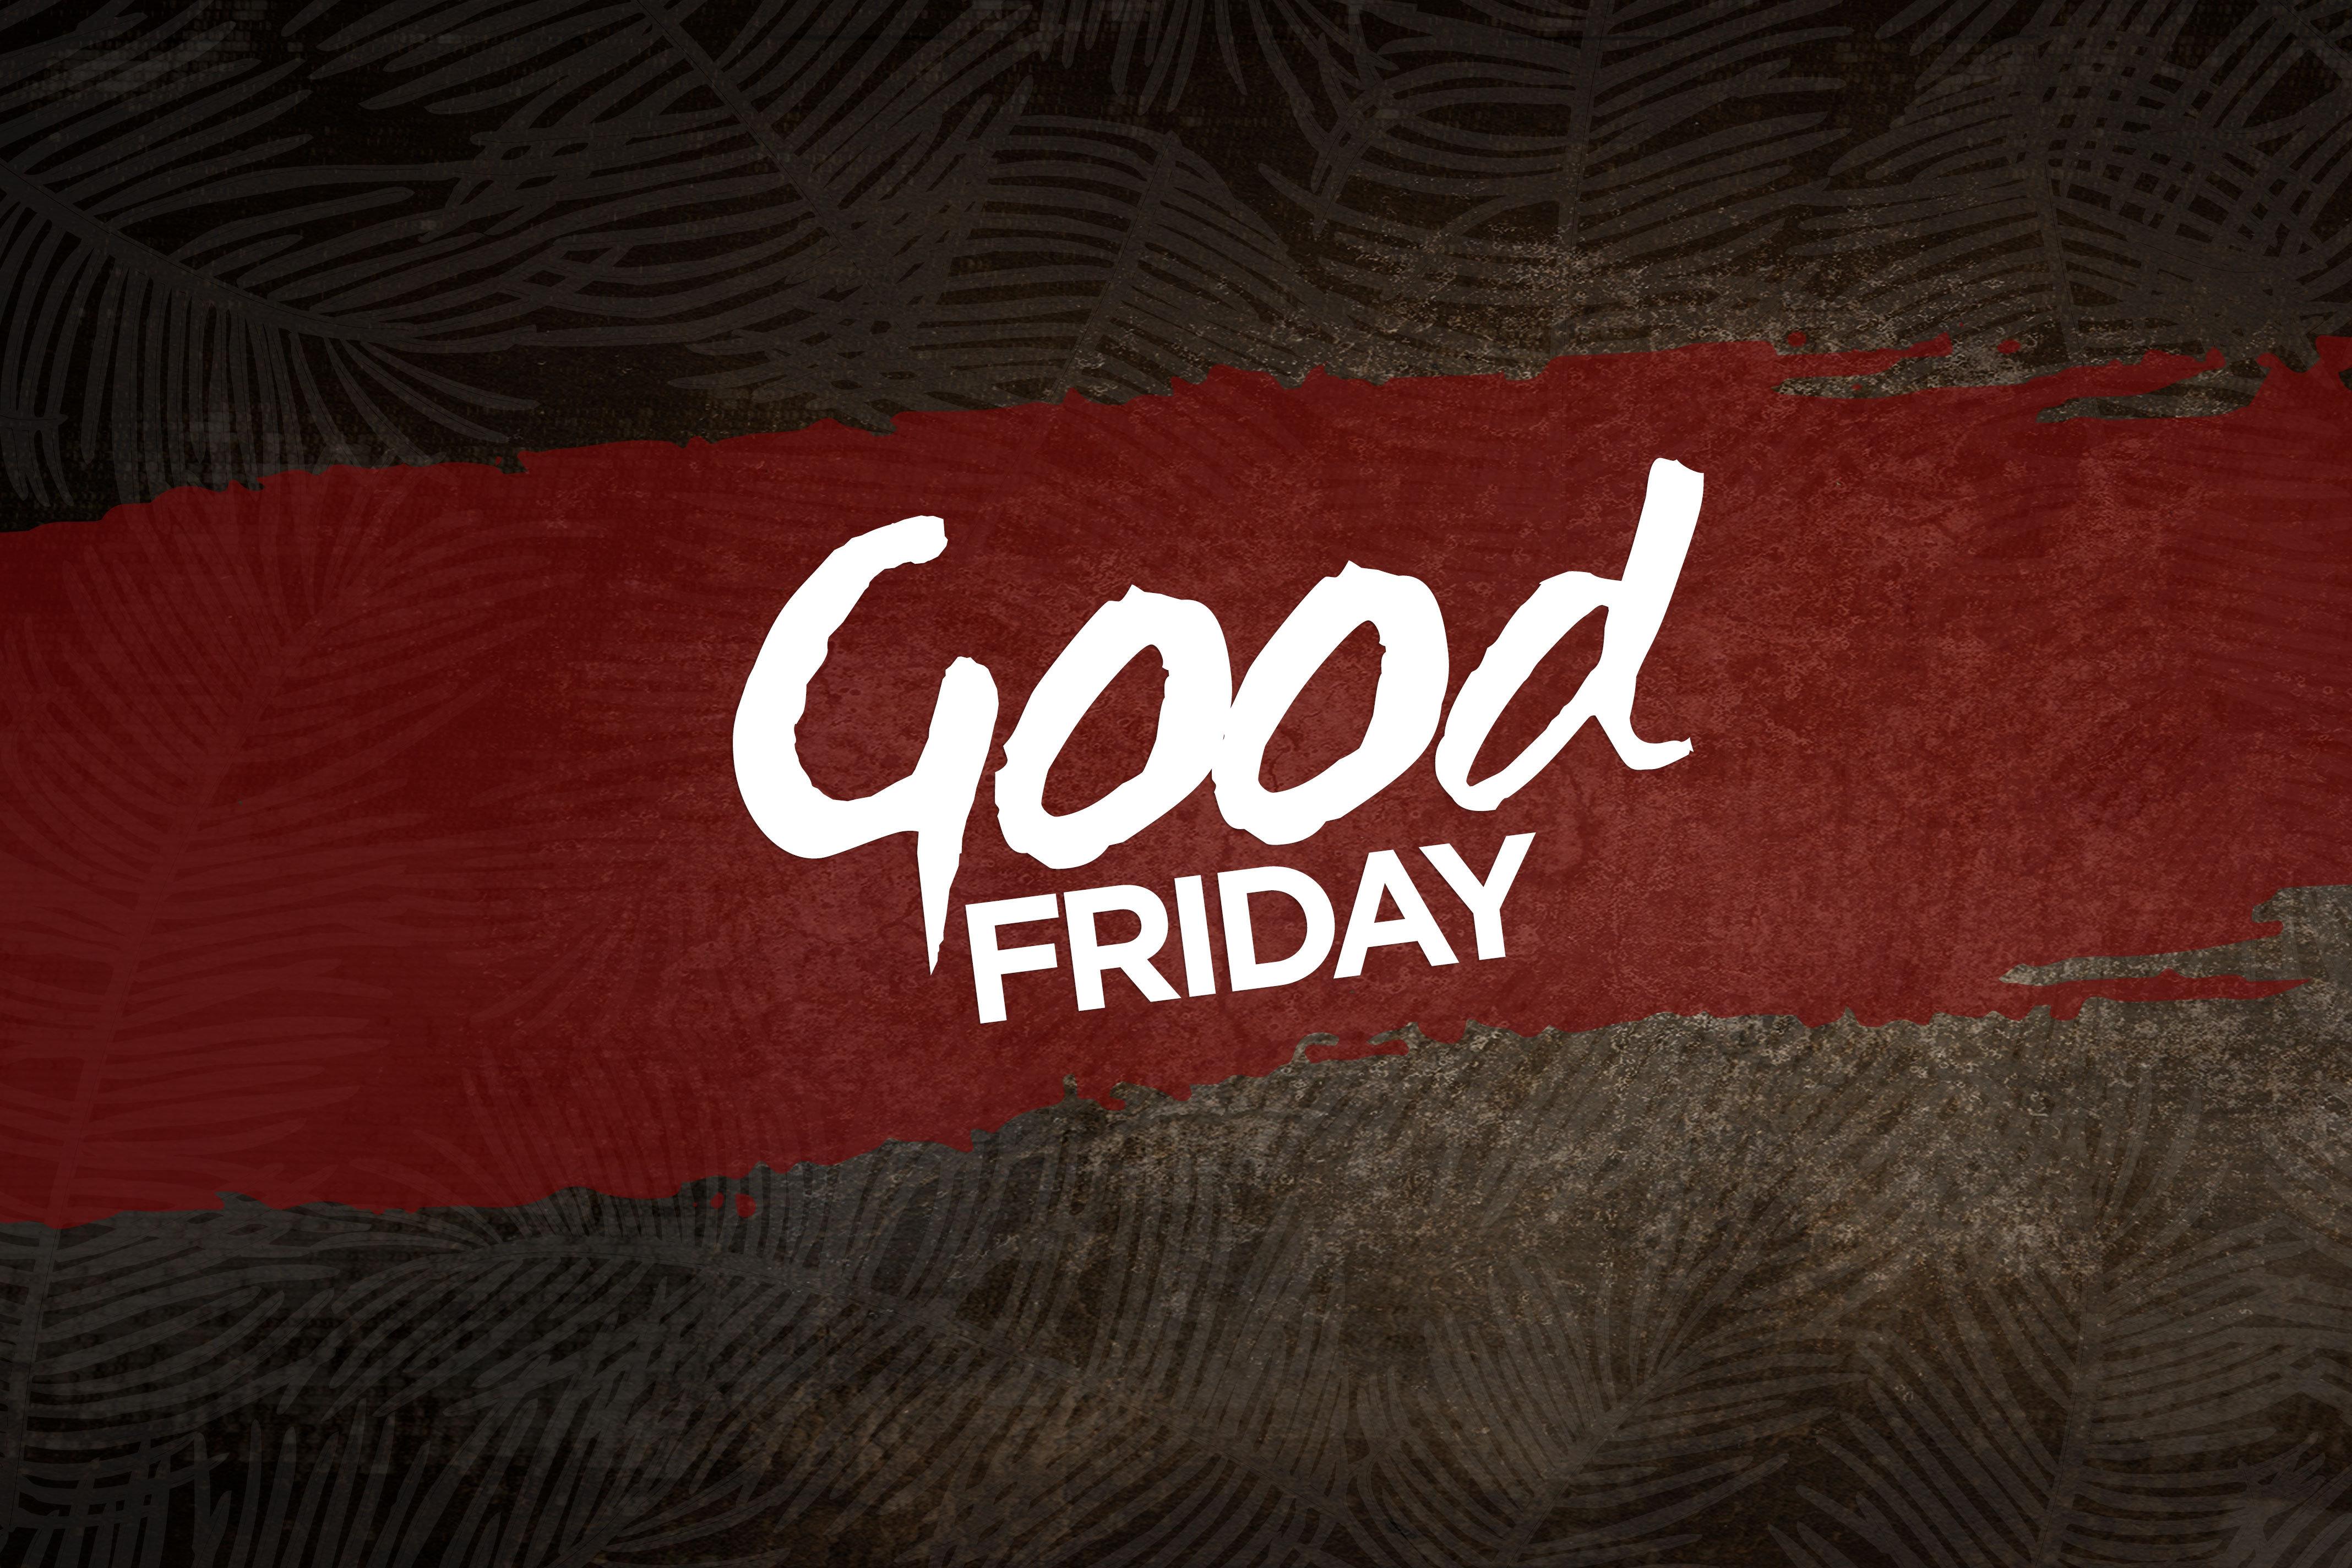 Good Friday Full Hd